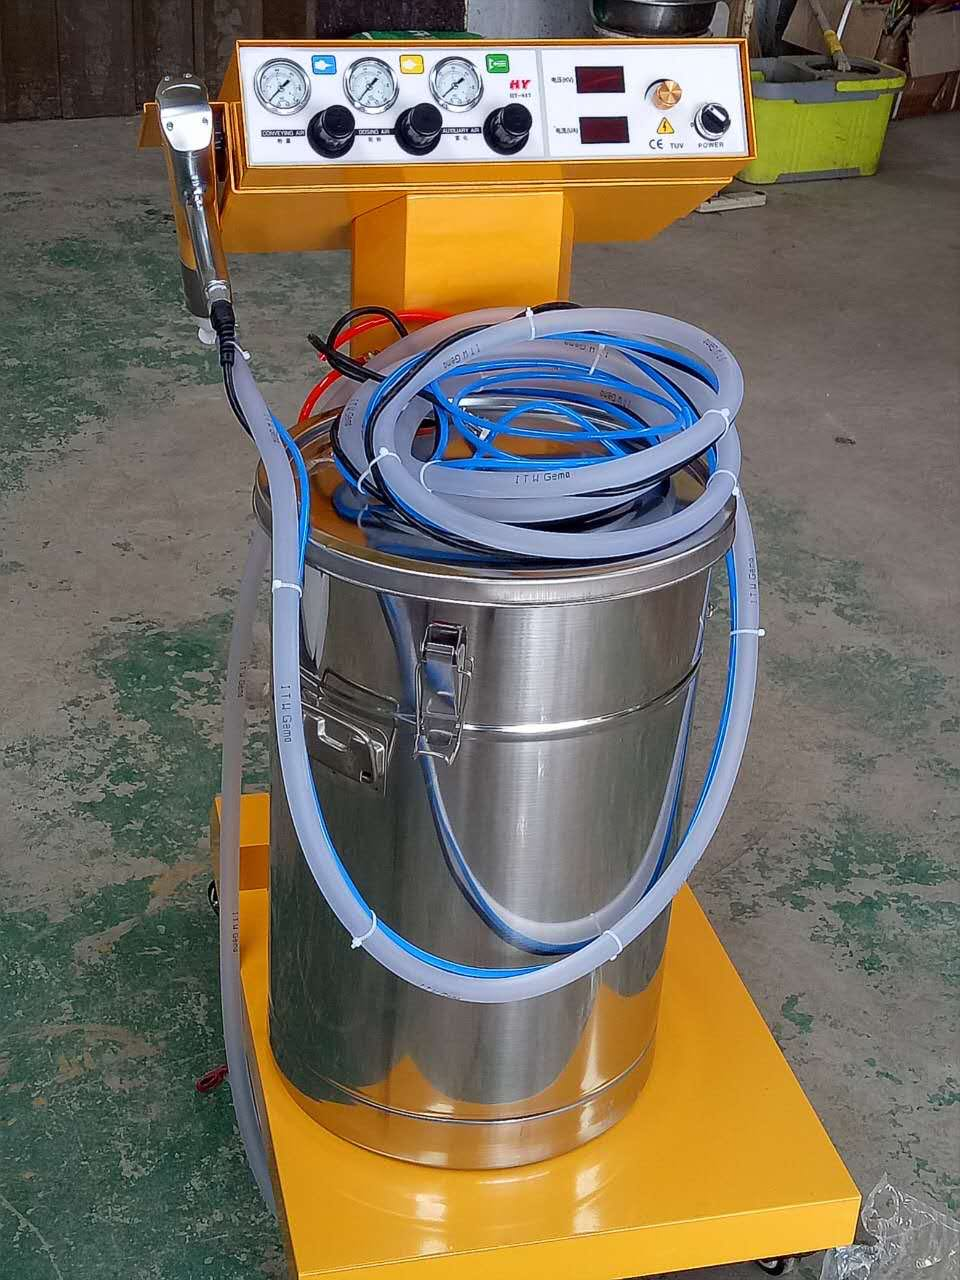 Electrostatic Spray Powder Coating Machine High pressure spray molding machine ELECTROSTATIC DUSTER SPRAYER wx 958 electrostatic powder coating machine wx 958 electrostatic spray powder coating machine spraying gun paint